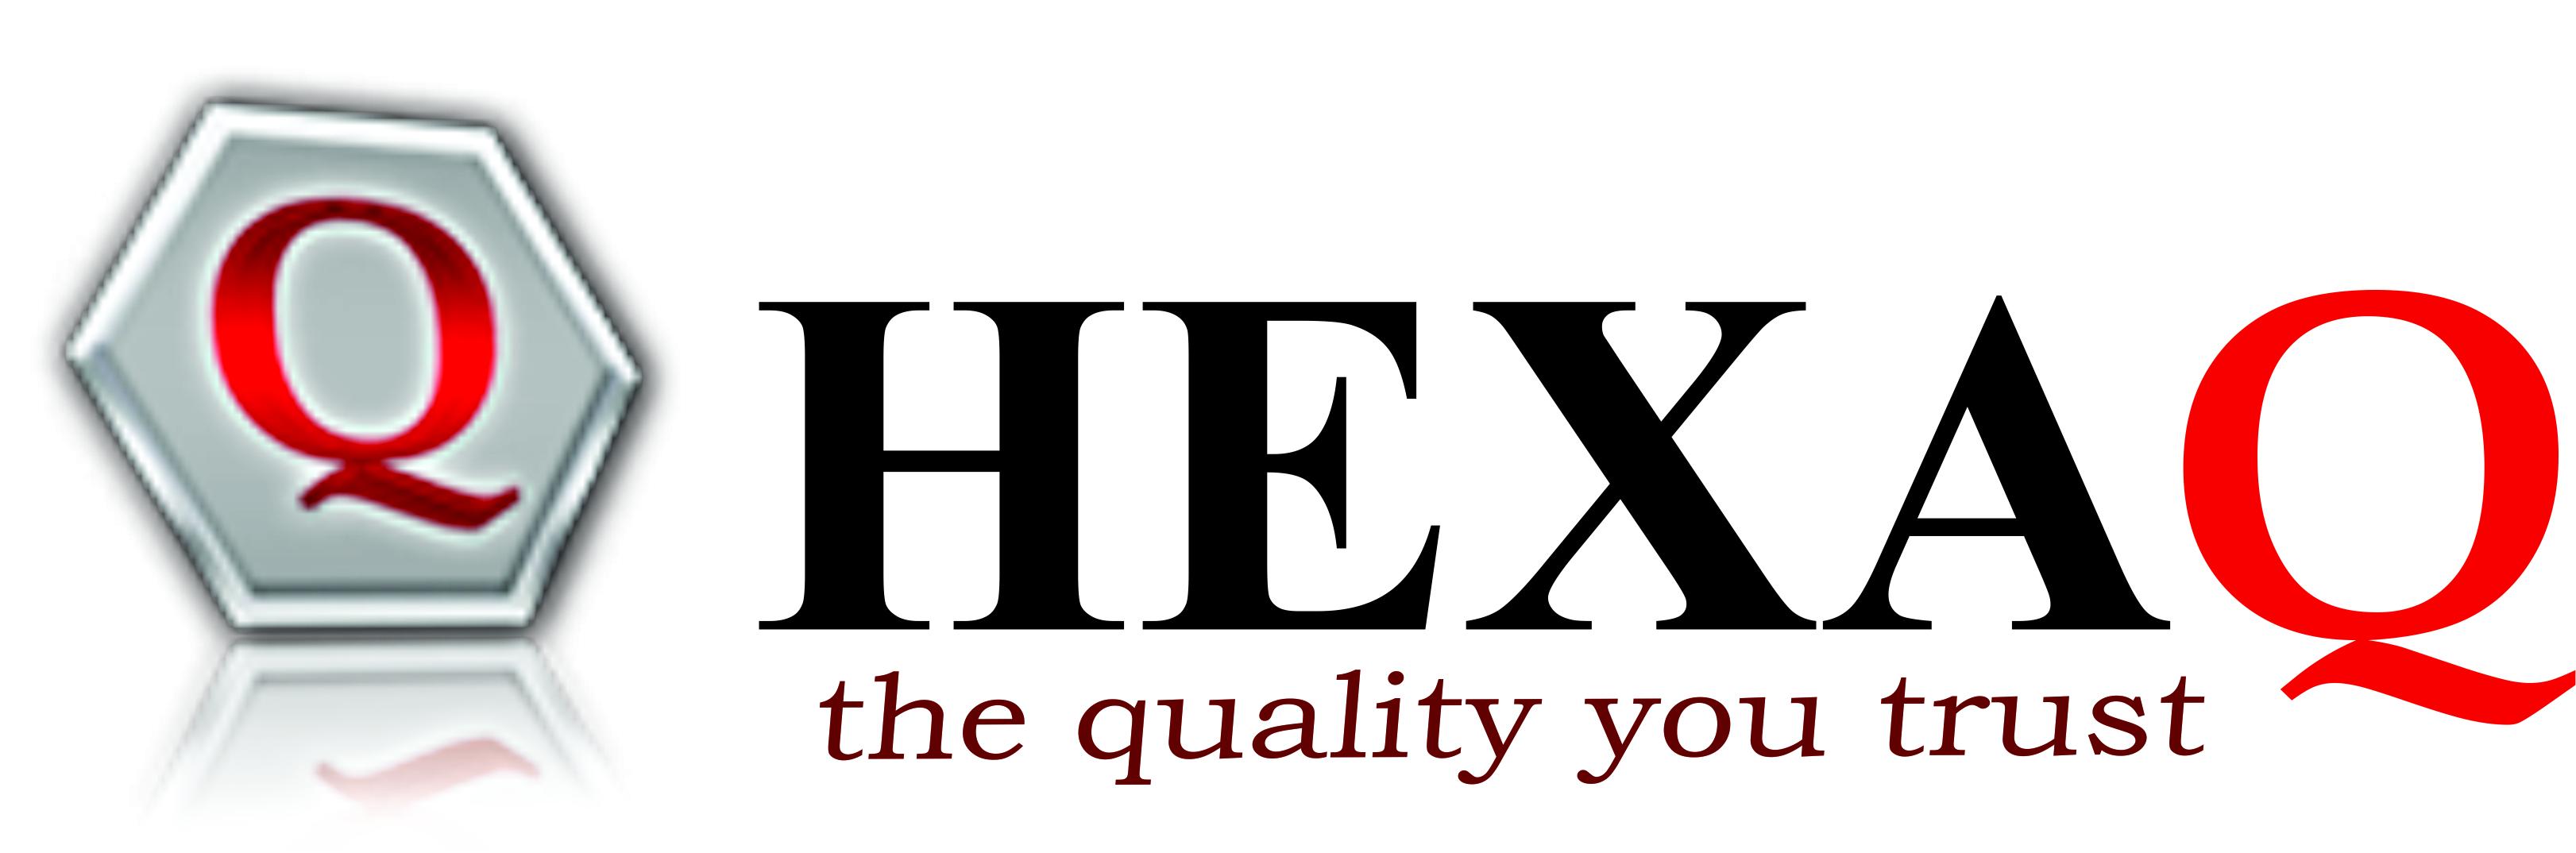 logo hexa